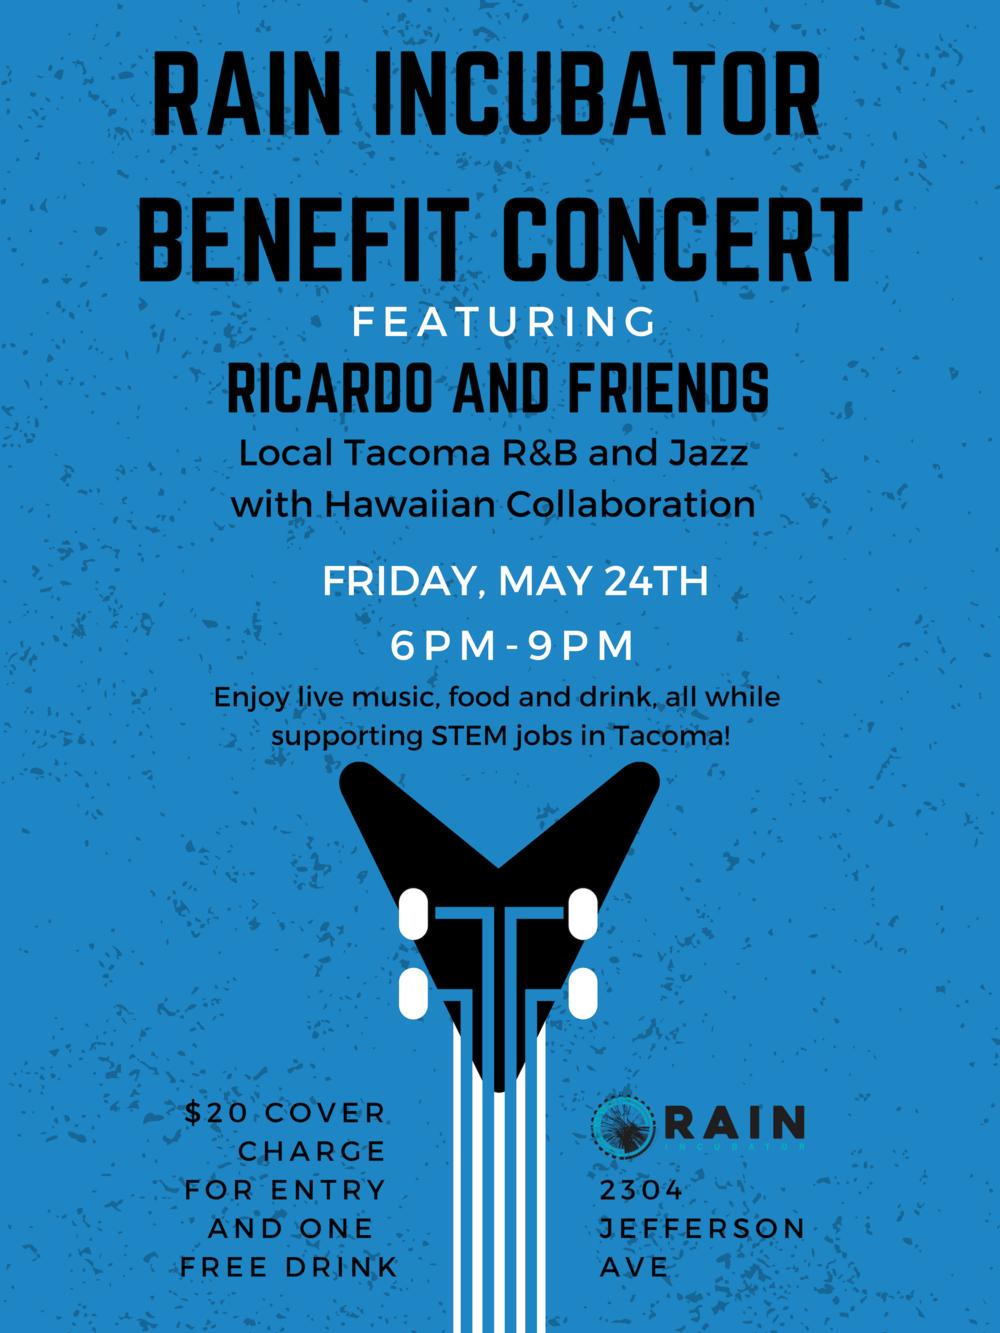 Copy of RAIN Incubator Benefit Concert (2).png